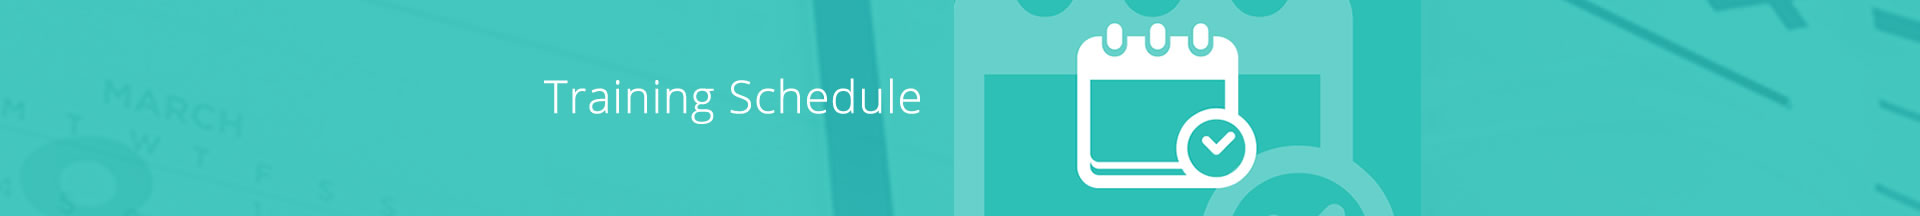 Mcse Boot Camp Schedule Azure Boot Camp Schedule Mcse